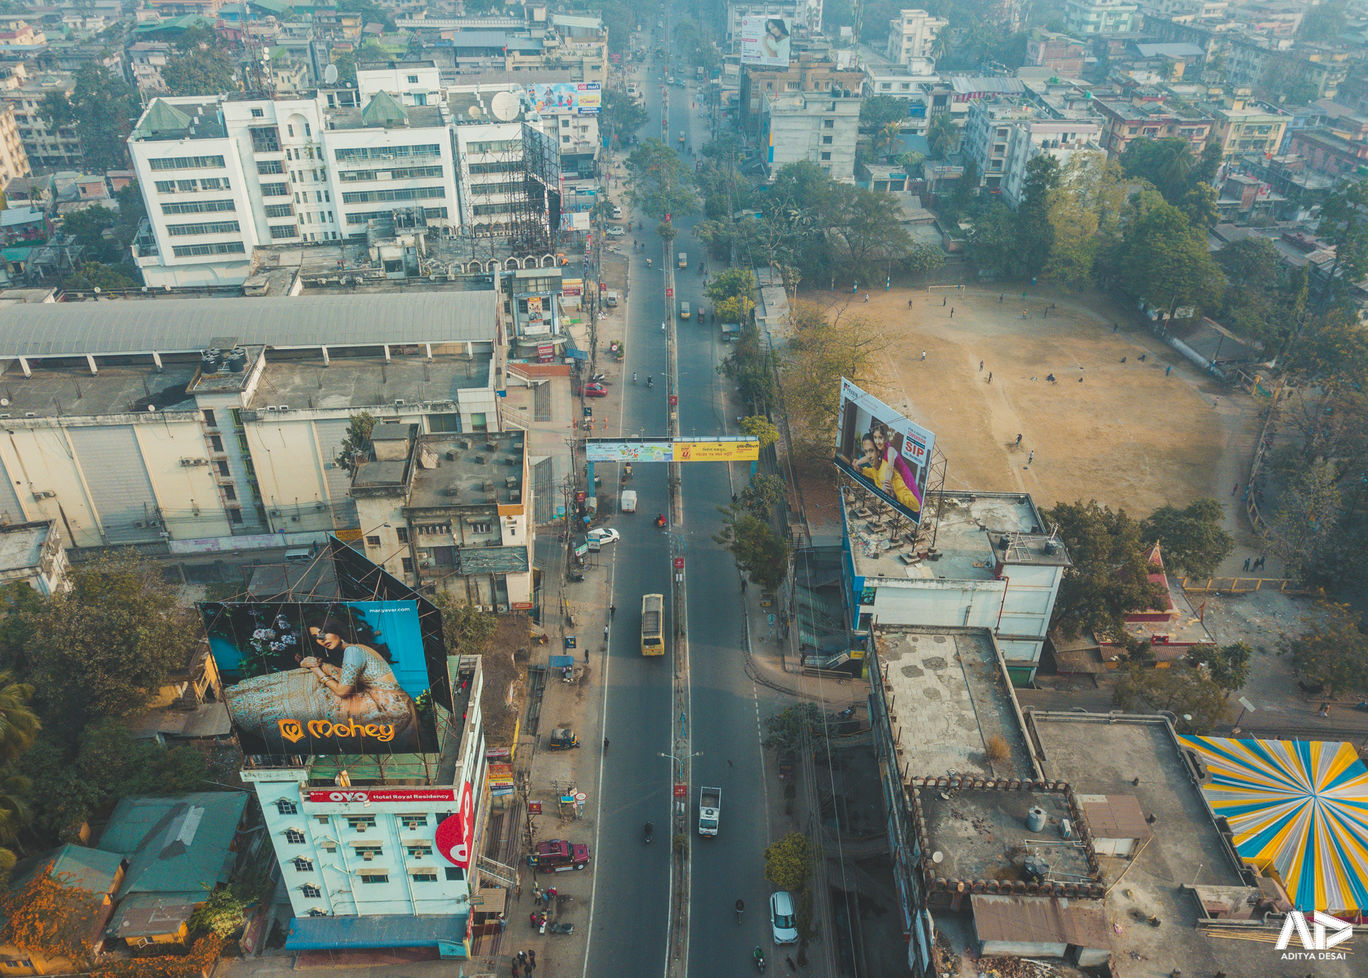 Photo of Kalimpong By Aditya Desai